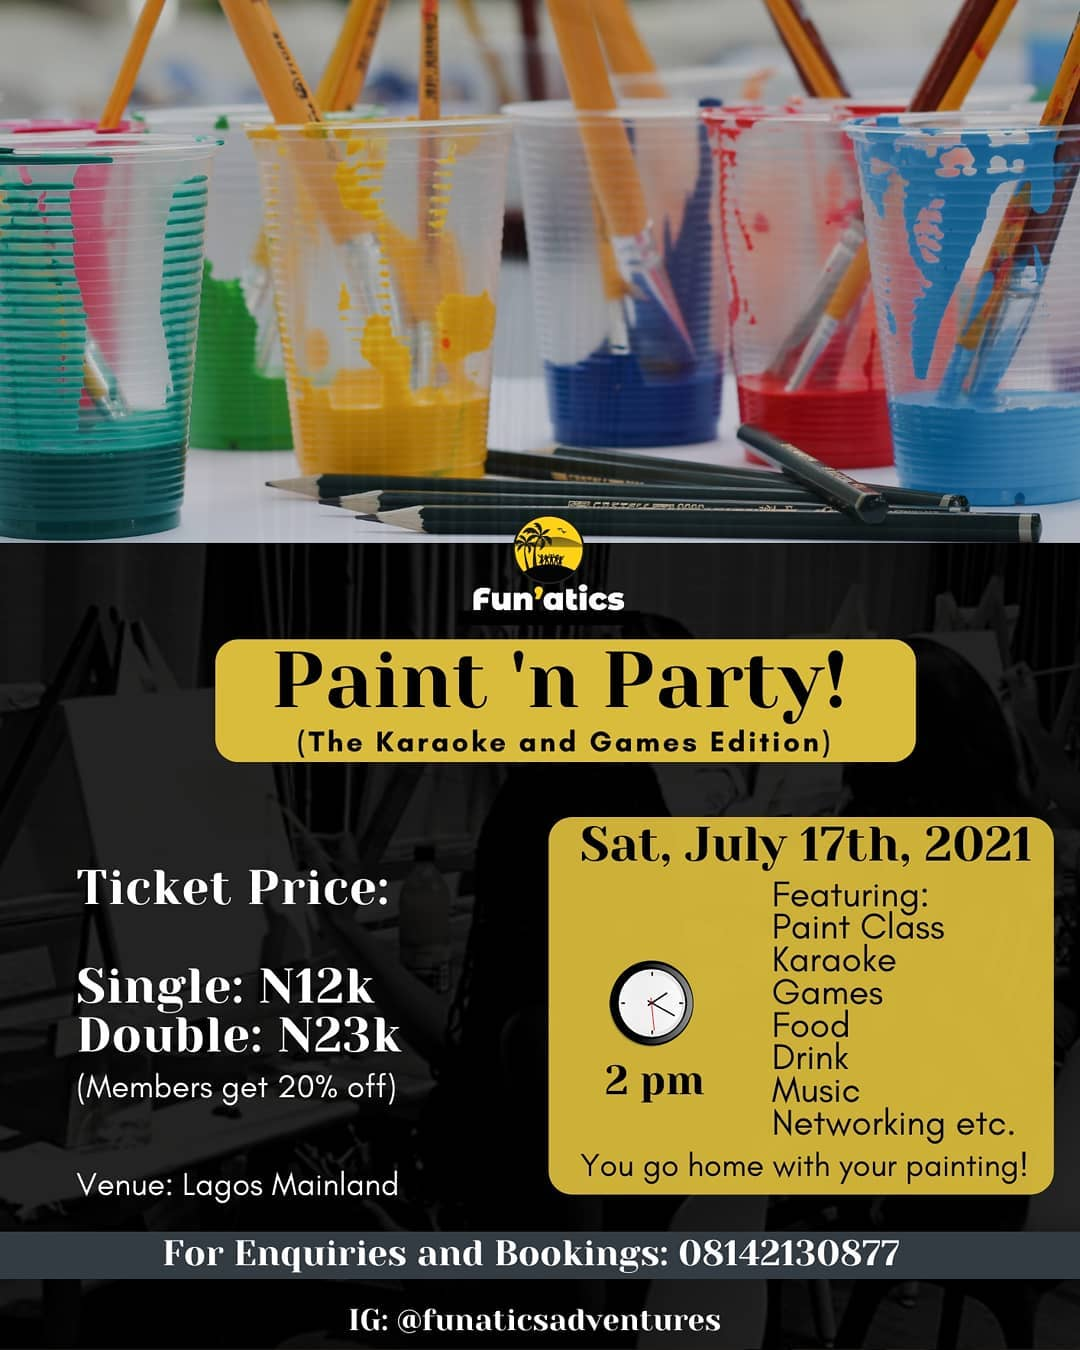 Paint 'n Party